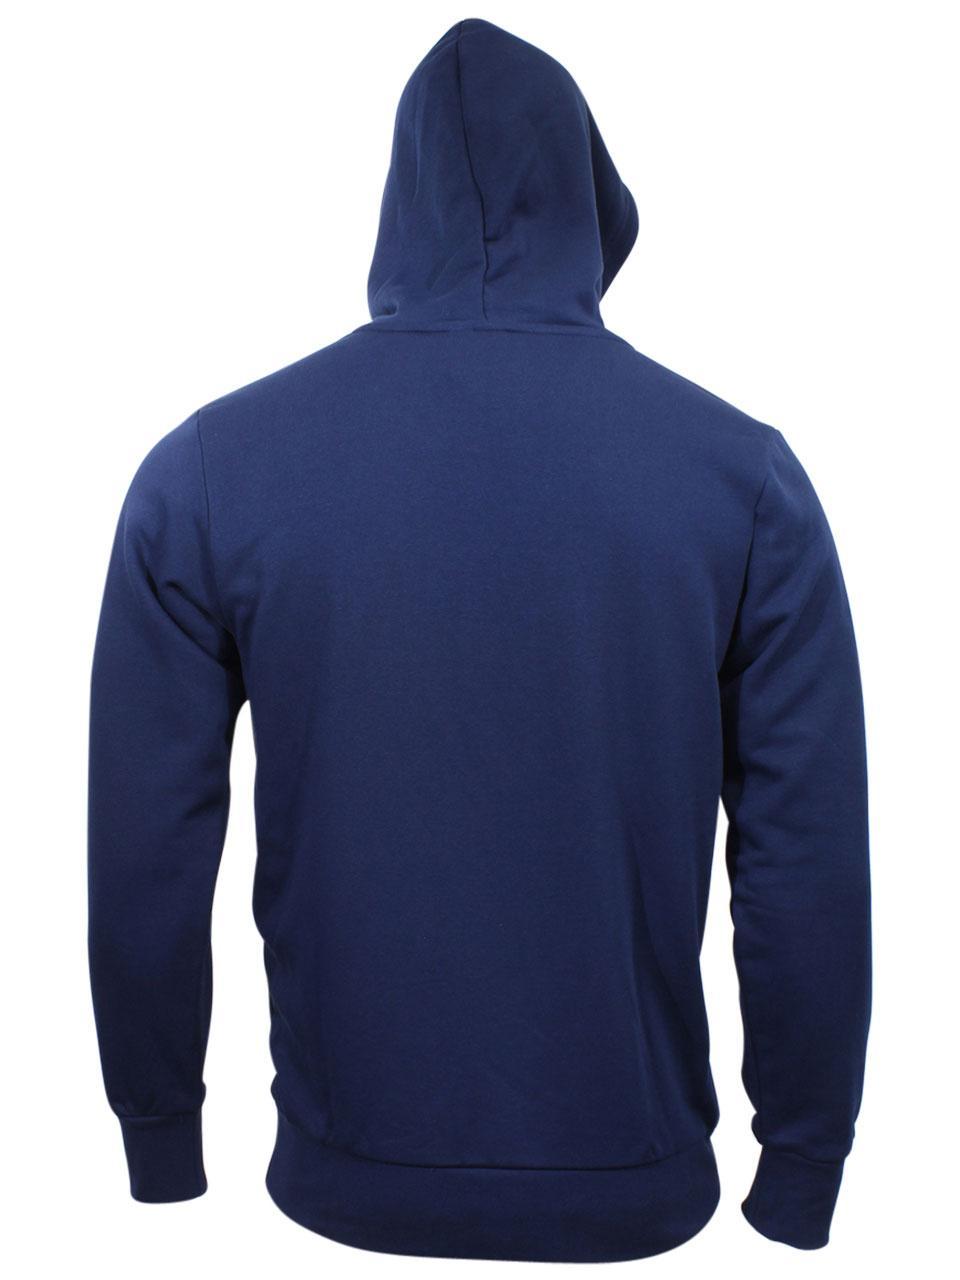 f4d9d4836ba Adidas Men s Essentials Linear Logo Pullover Hoodie Sweatshirt